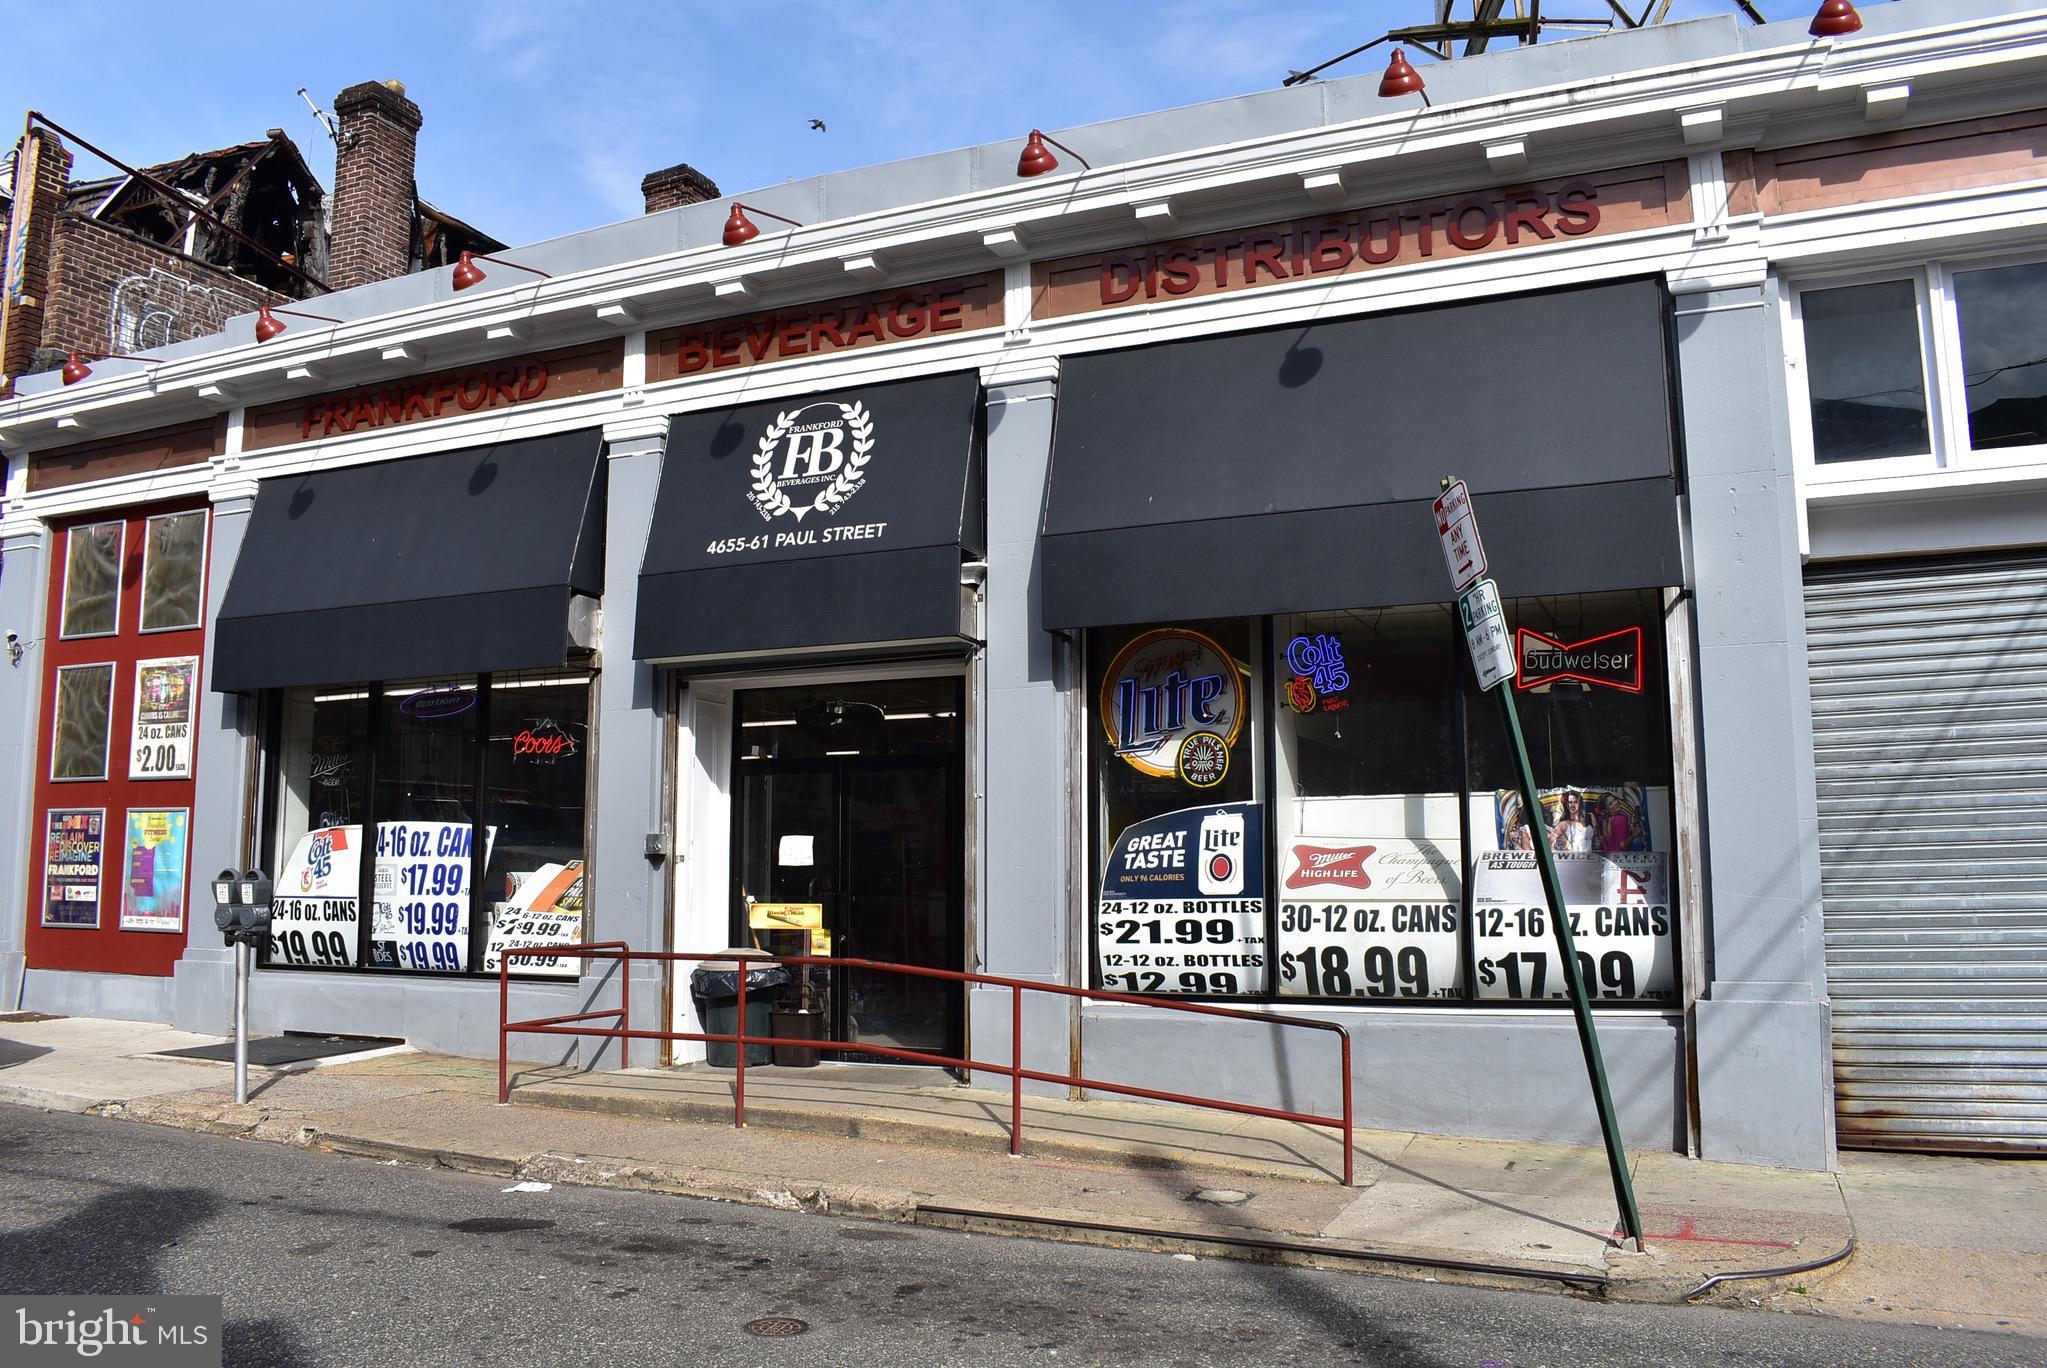 4655 PAUL STREET, PHILADELPHIA, PA 19124